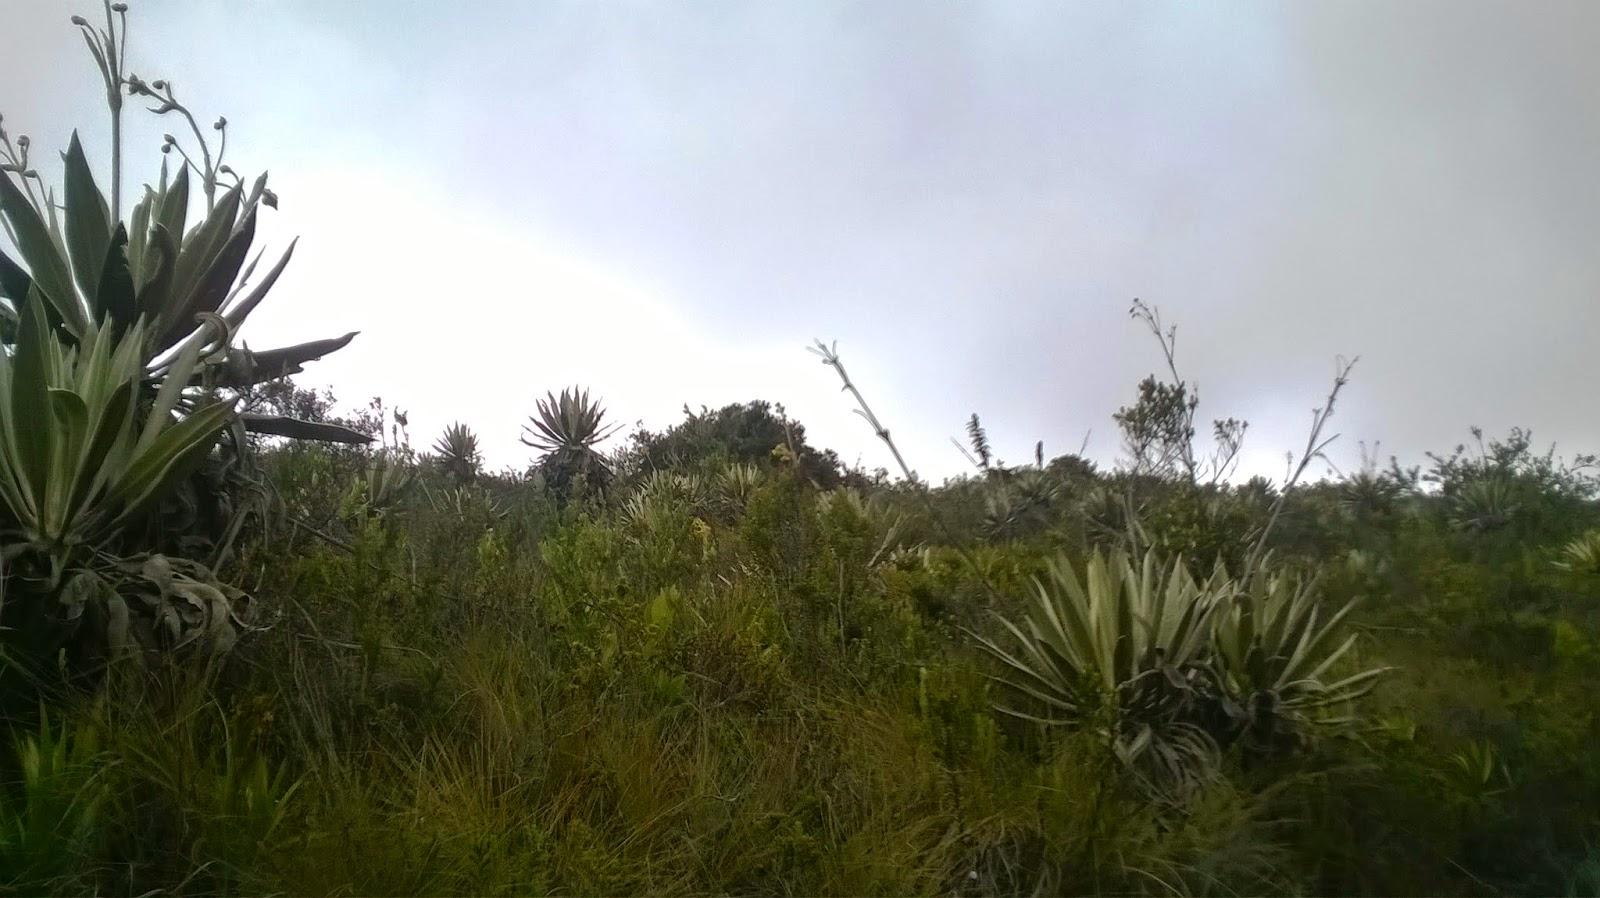 Especies de plantas jard n bot nico jose celestino mutis for Caracteristicas de un jardin botanico